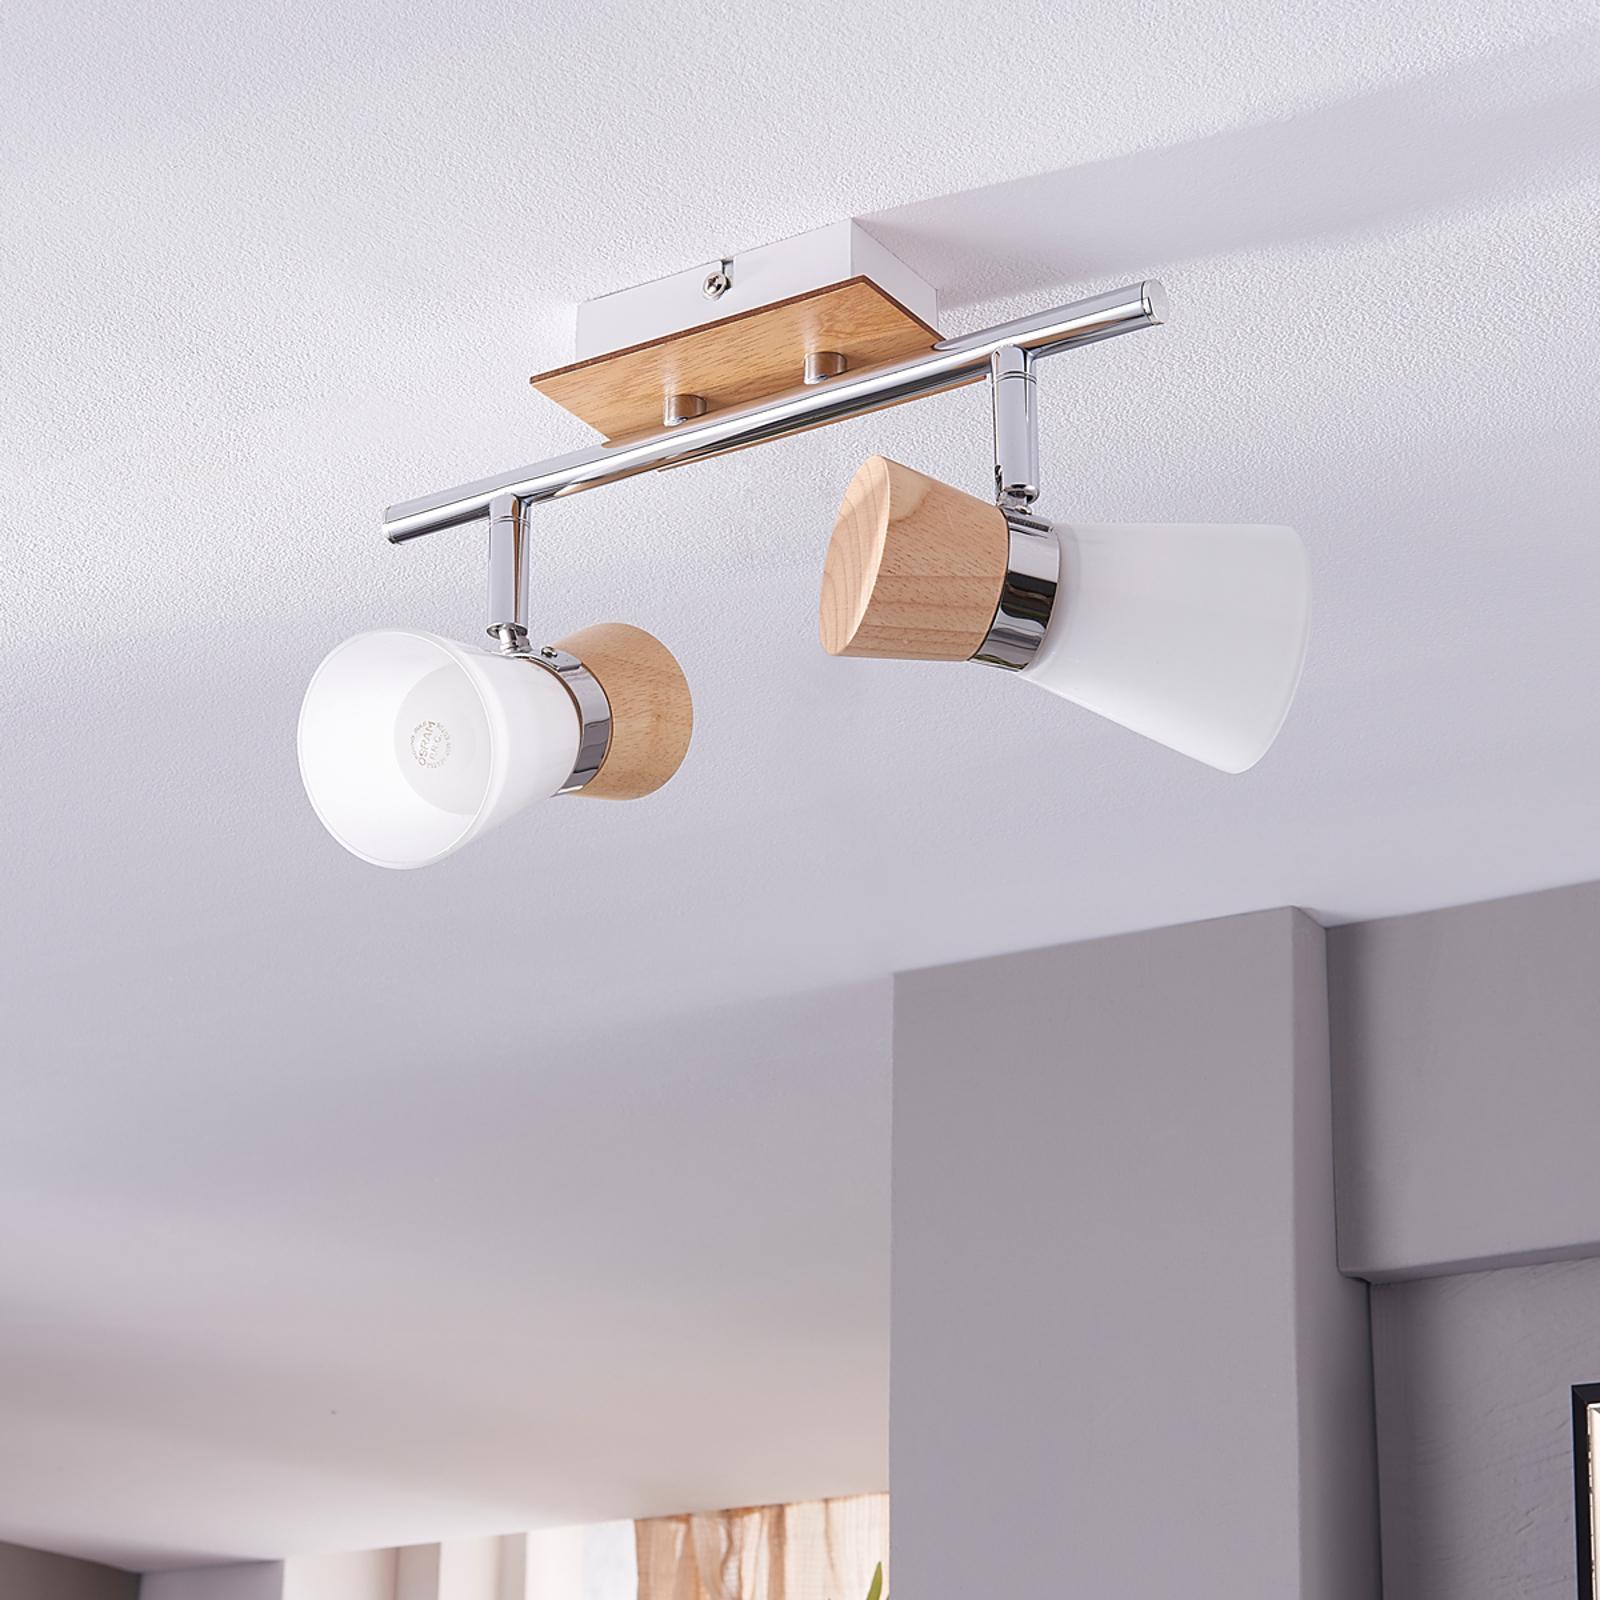 2-pits houten plafondlamp Vivica met glas